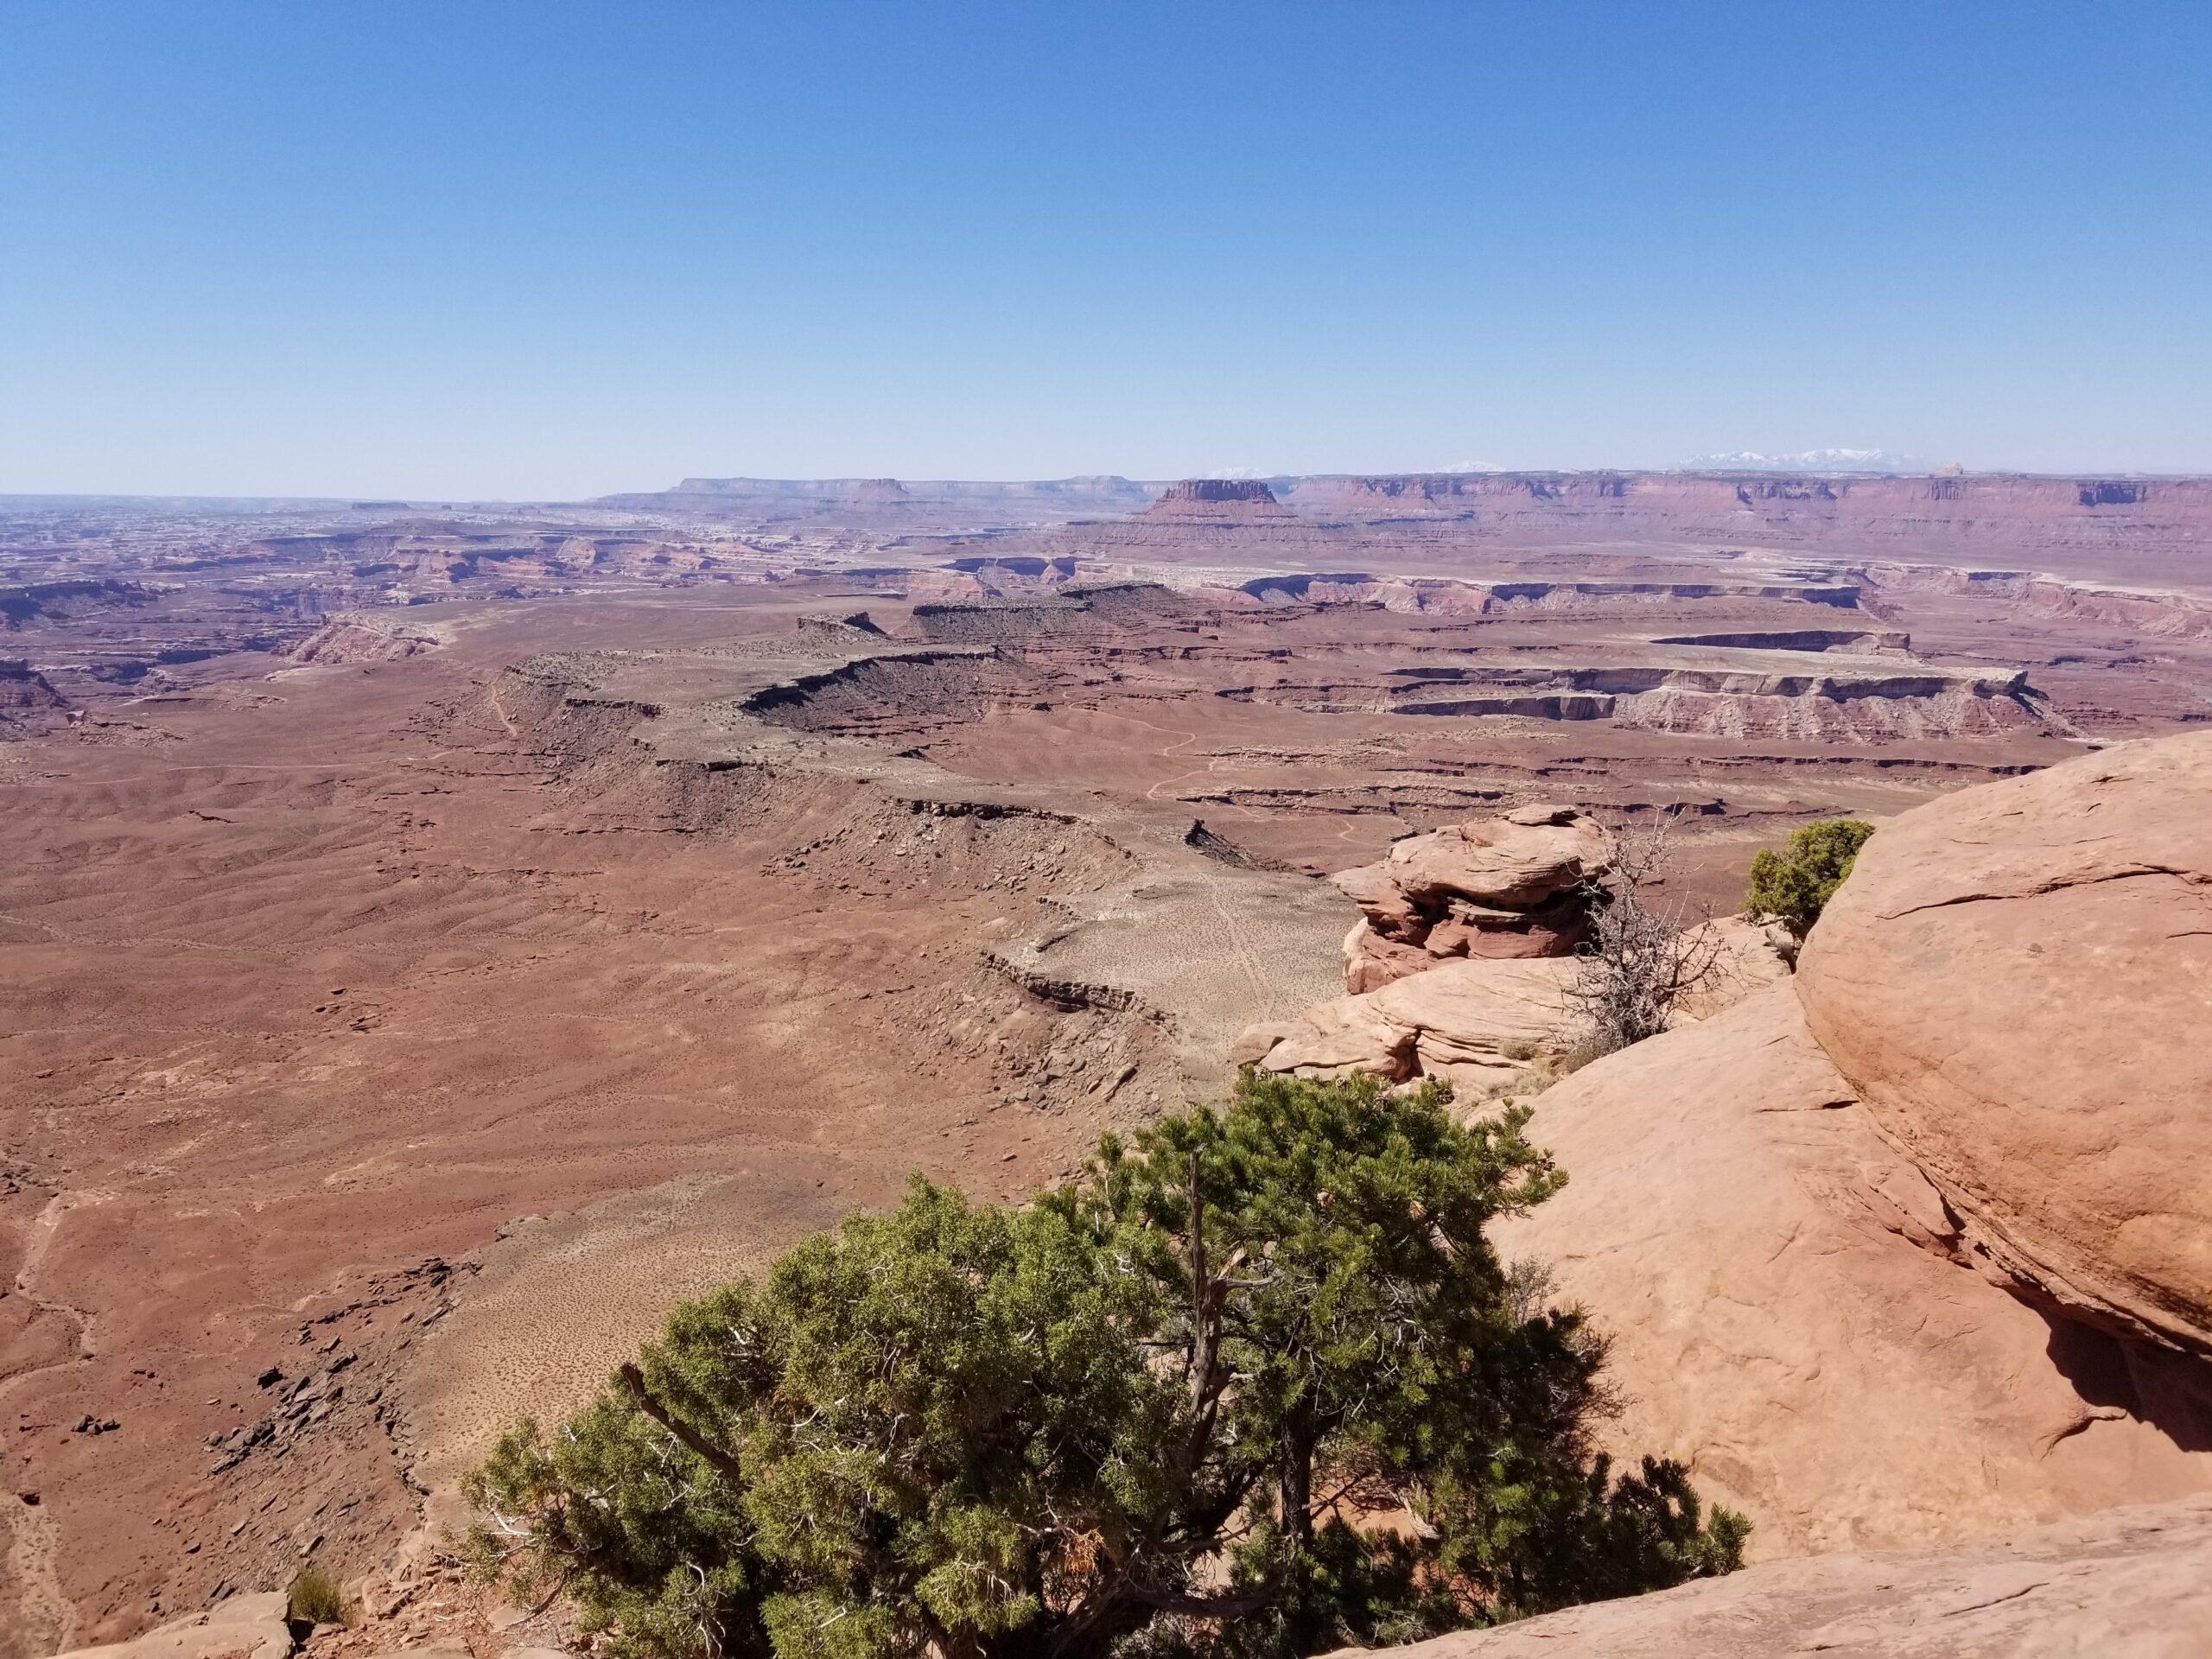 CanyonlandsVista6